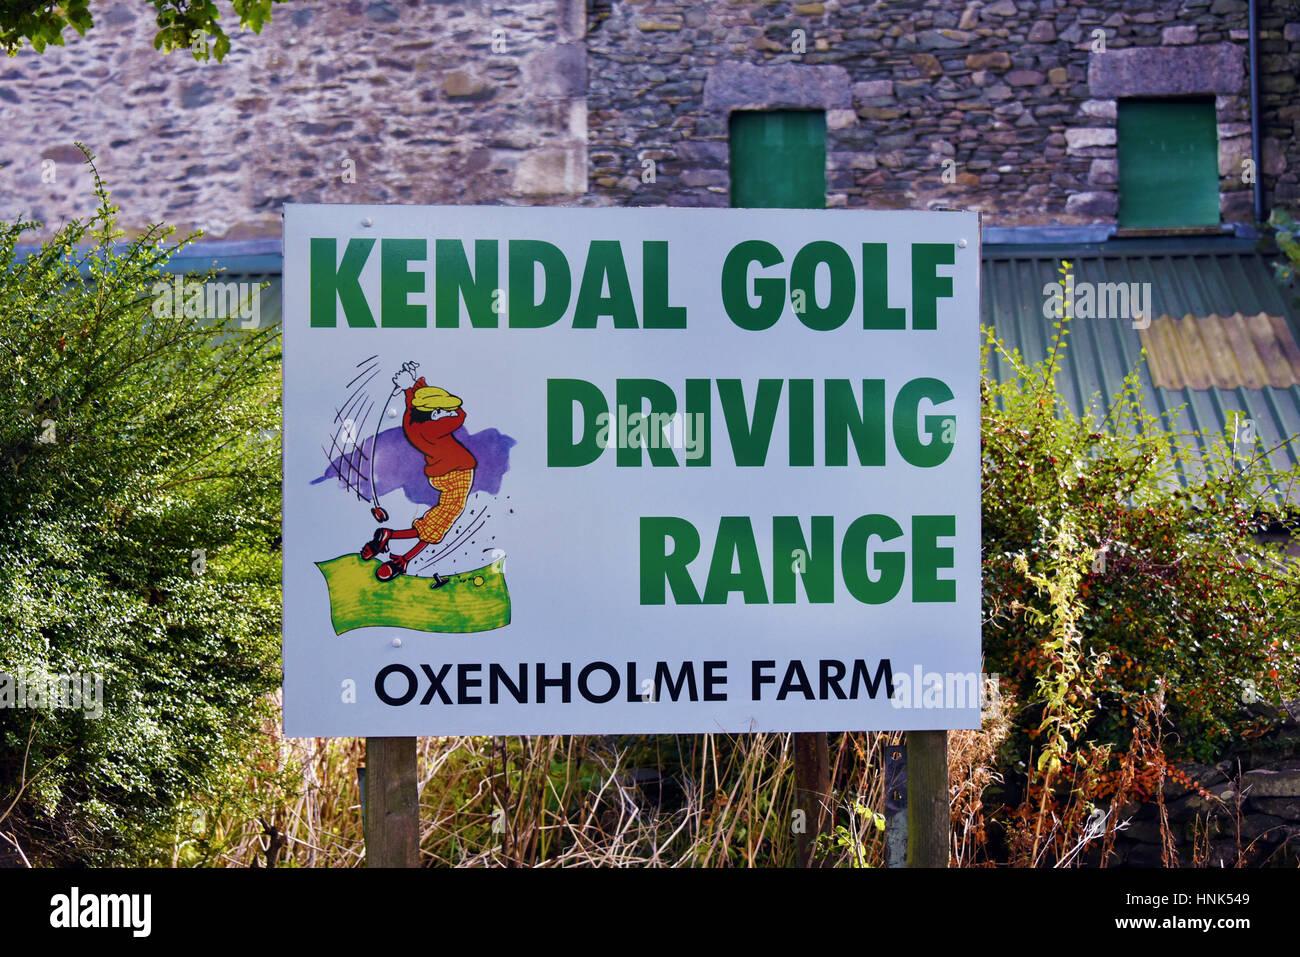 Signboard, Kendal Golf Driving Range. Oxenholme Farm, Oxenholm, Cumbria, England, United Kingdom, Europe. - Stock Image